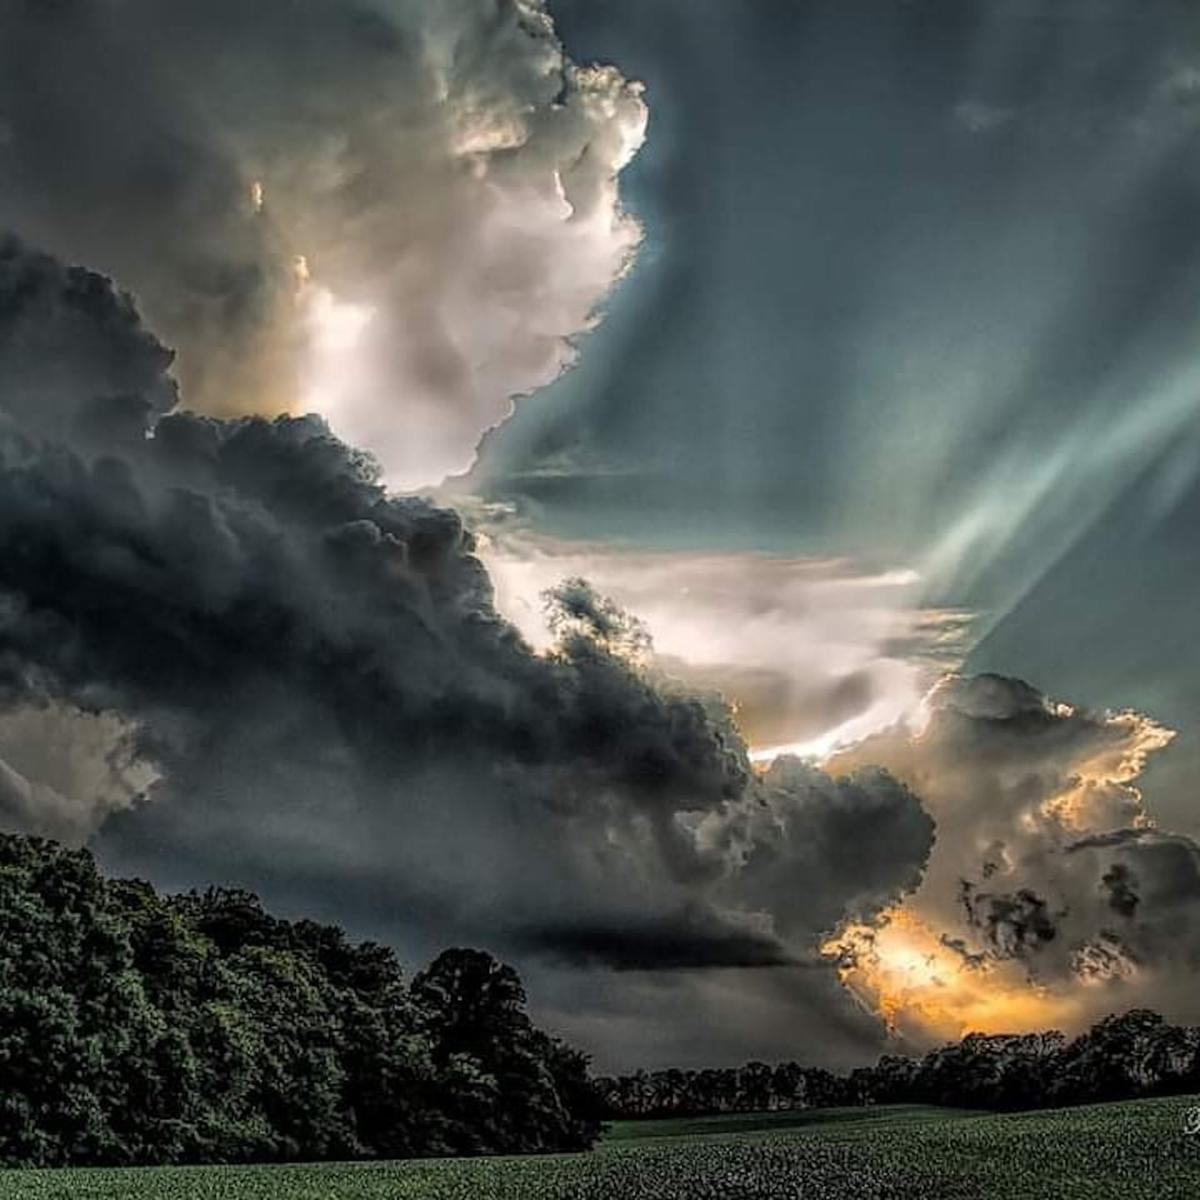 Storms over Hazleton